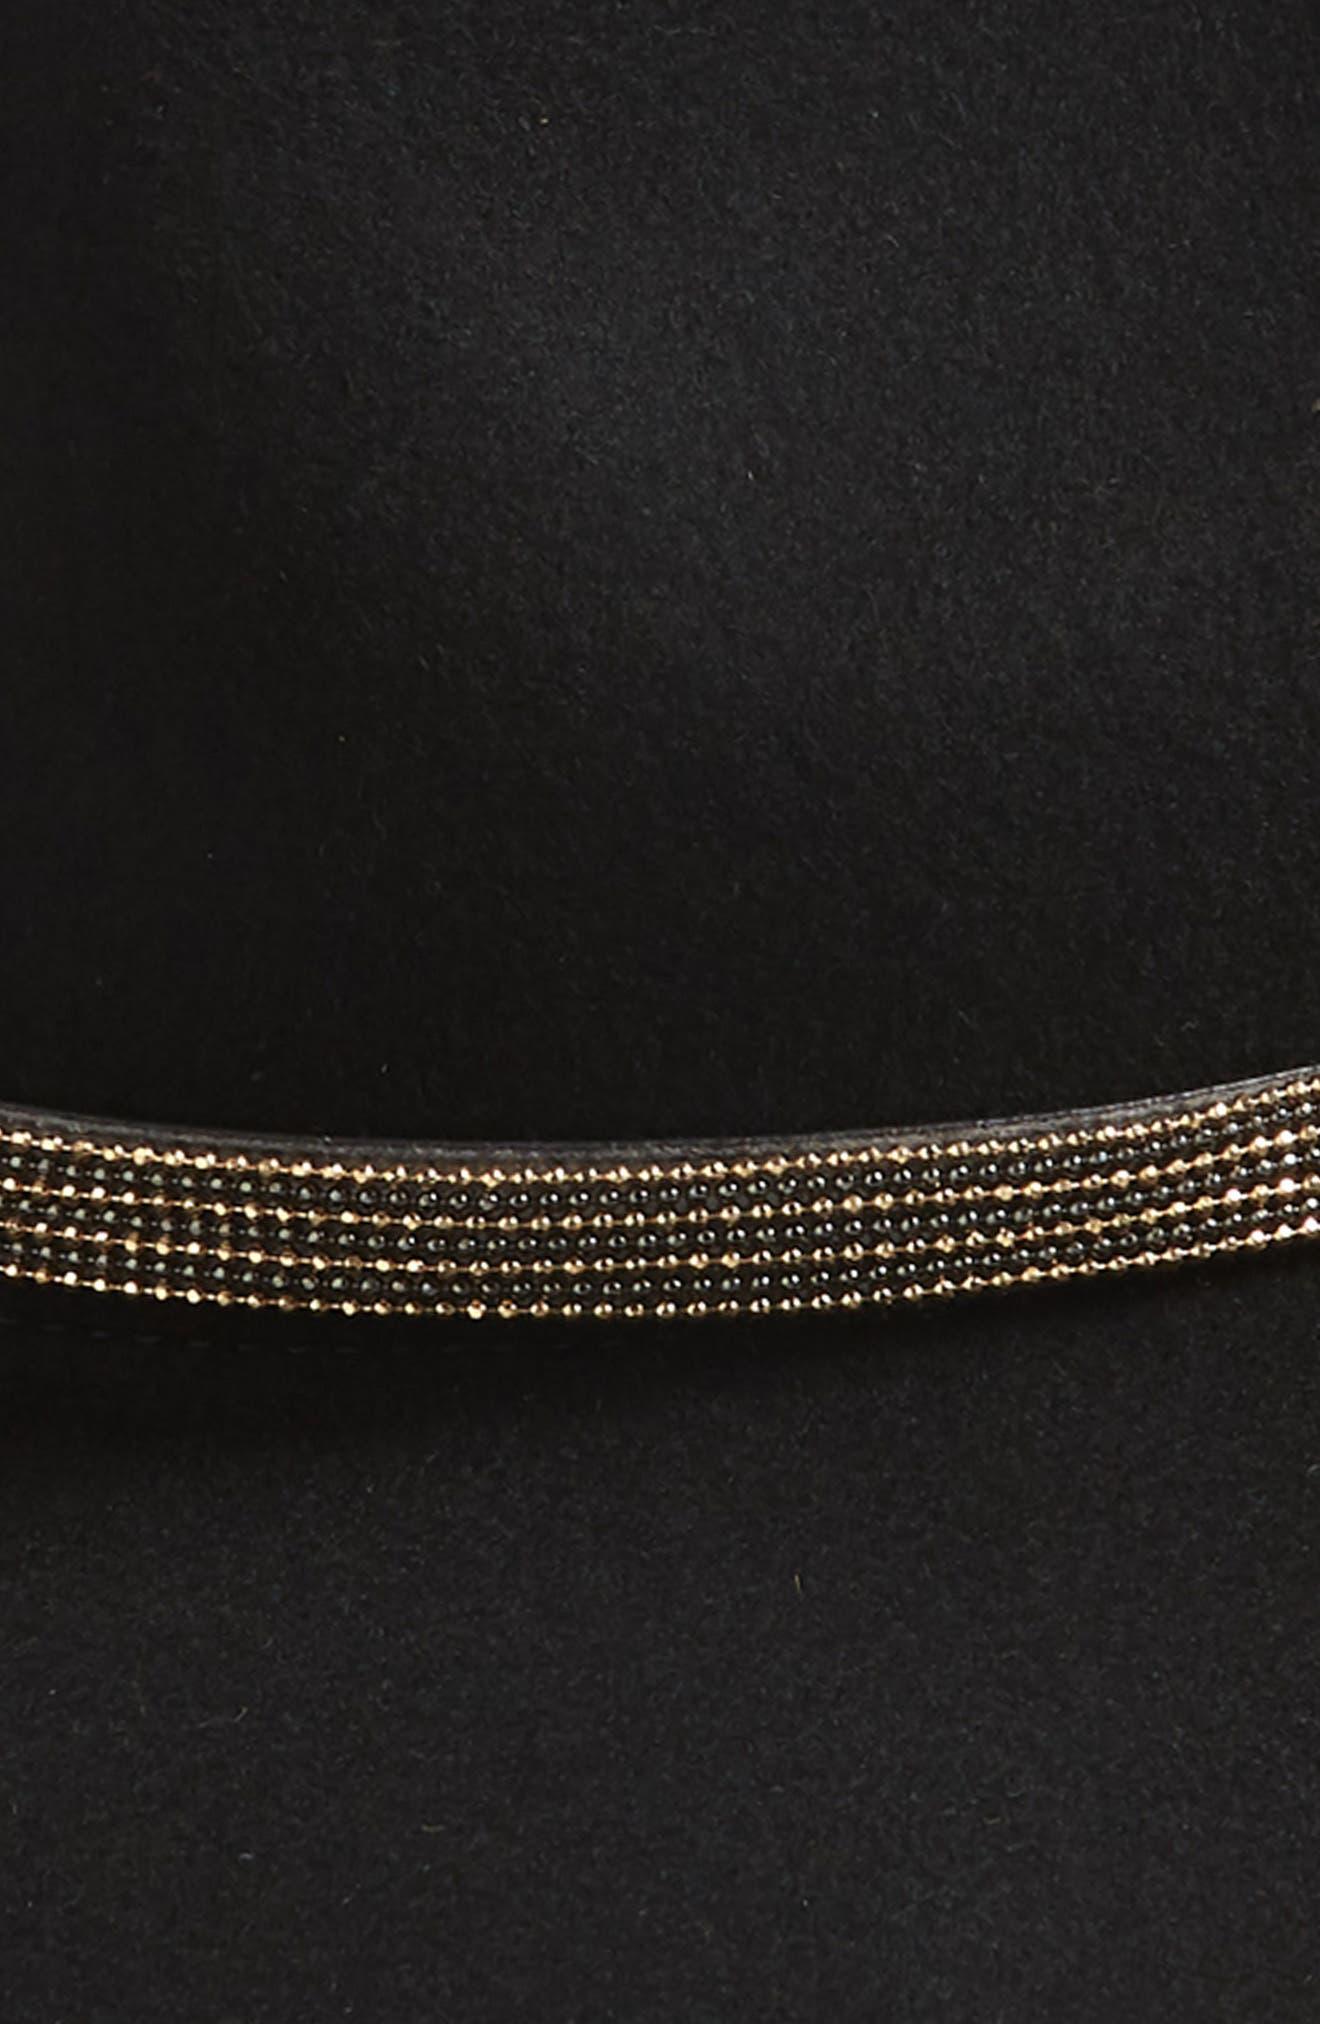 Beaded Chain Wool Felt Panama Hat,                             Alternate thumbnail 2, color,                             001